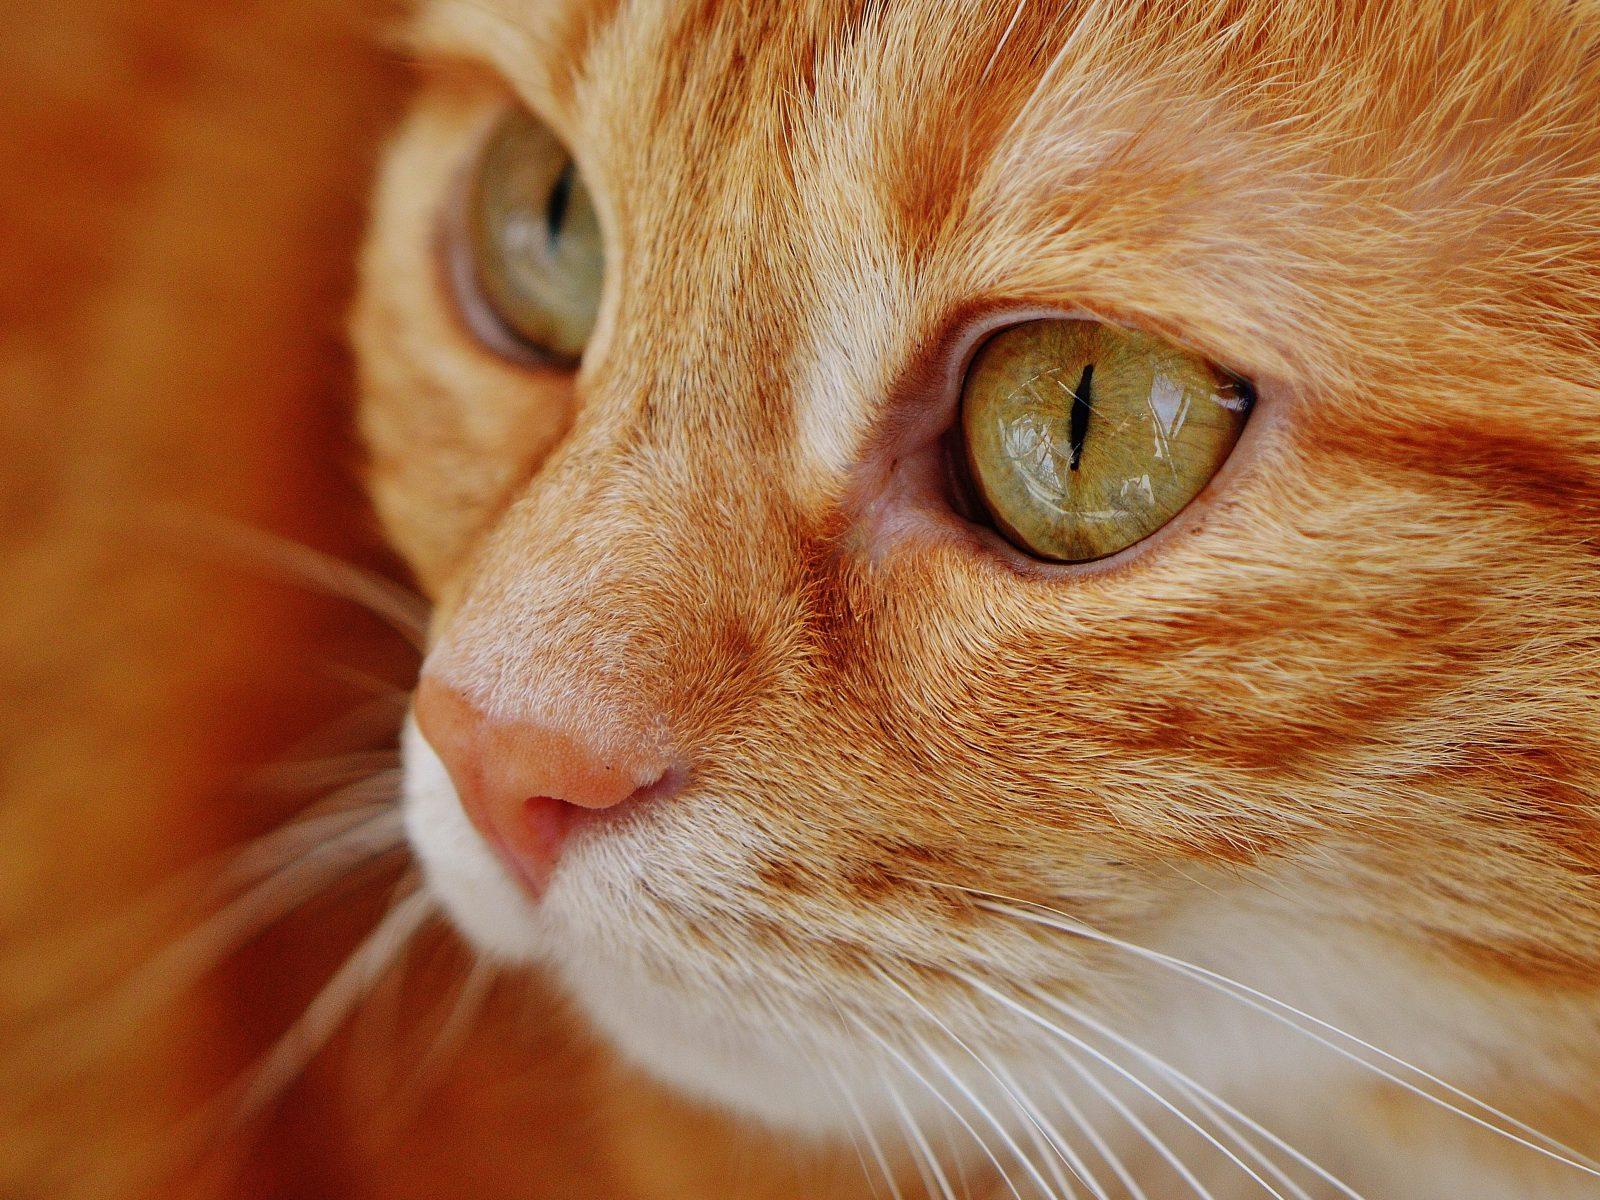 Singam 3 Hd Wallpaper Cat Eyes Wallpaper 4k Hd Wallpaper Background